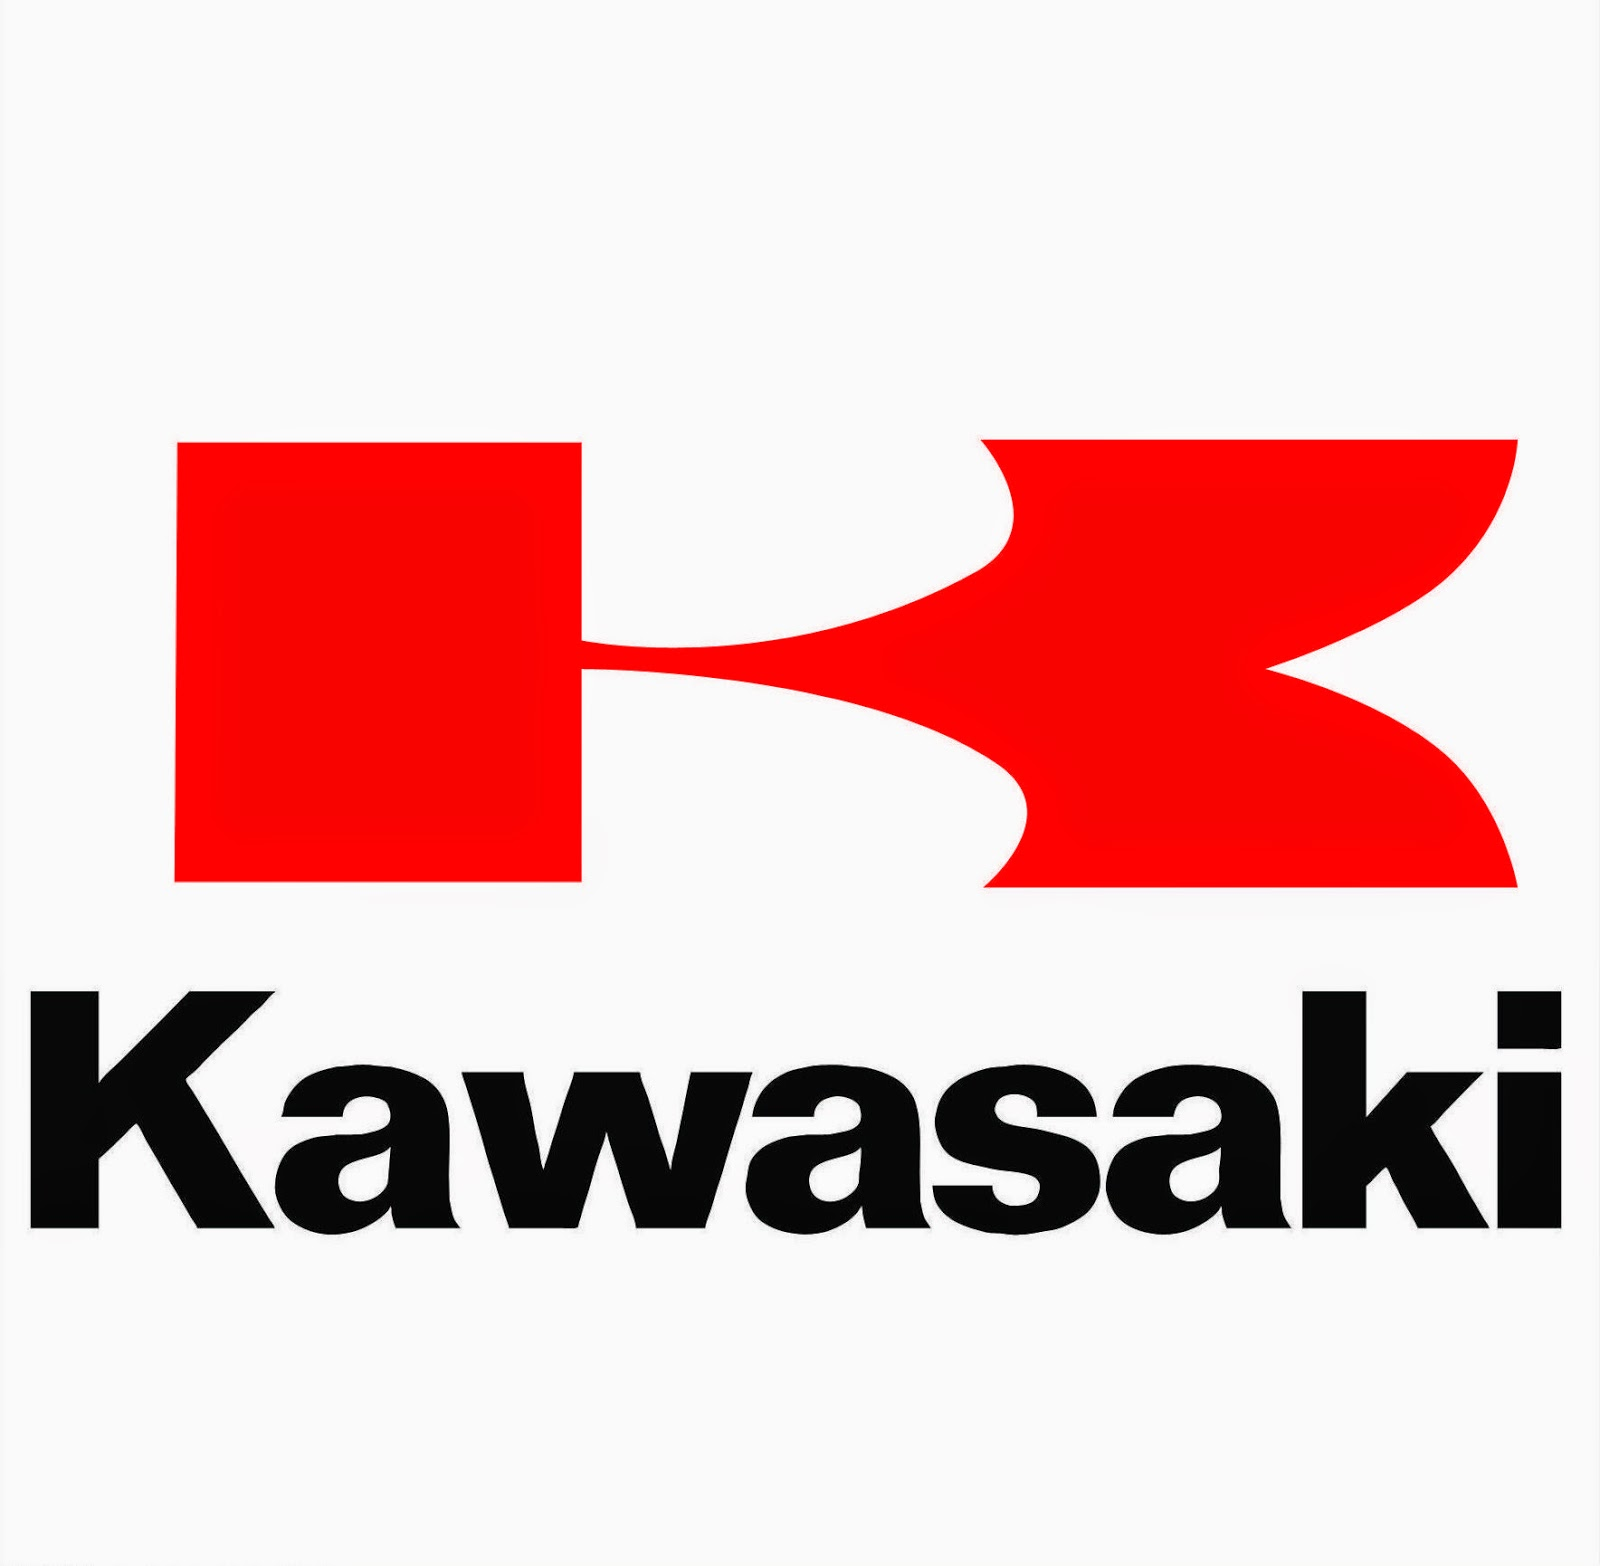 Modifikasi Motor Kawasaki logo